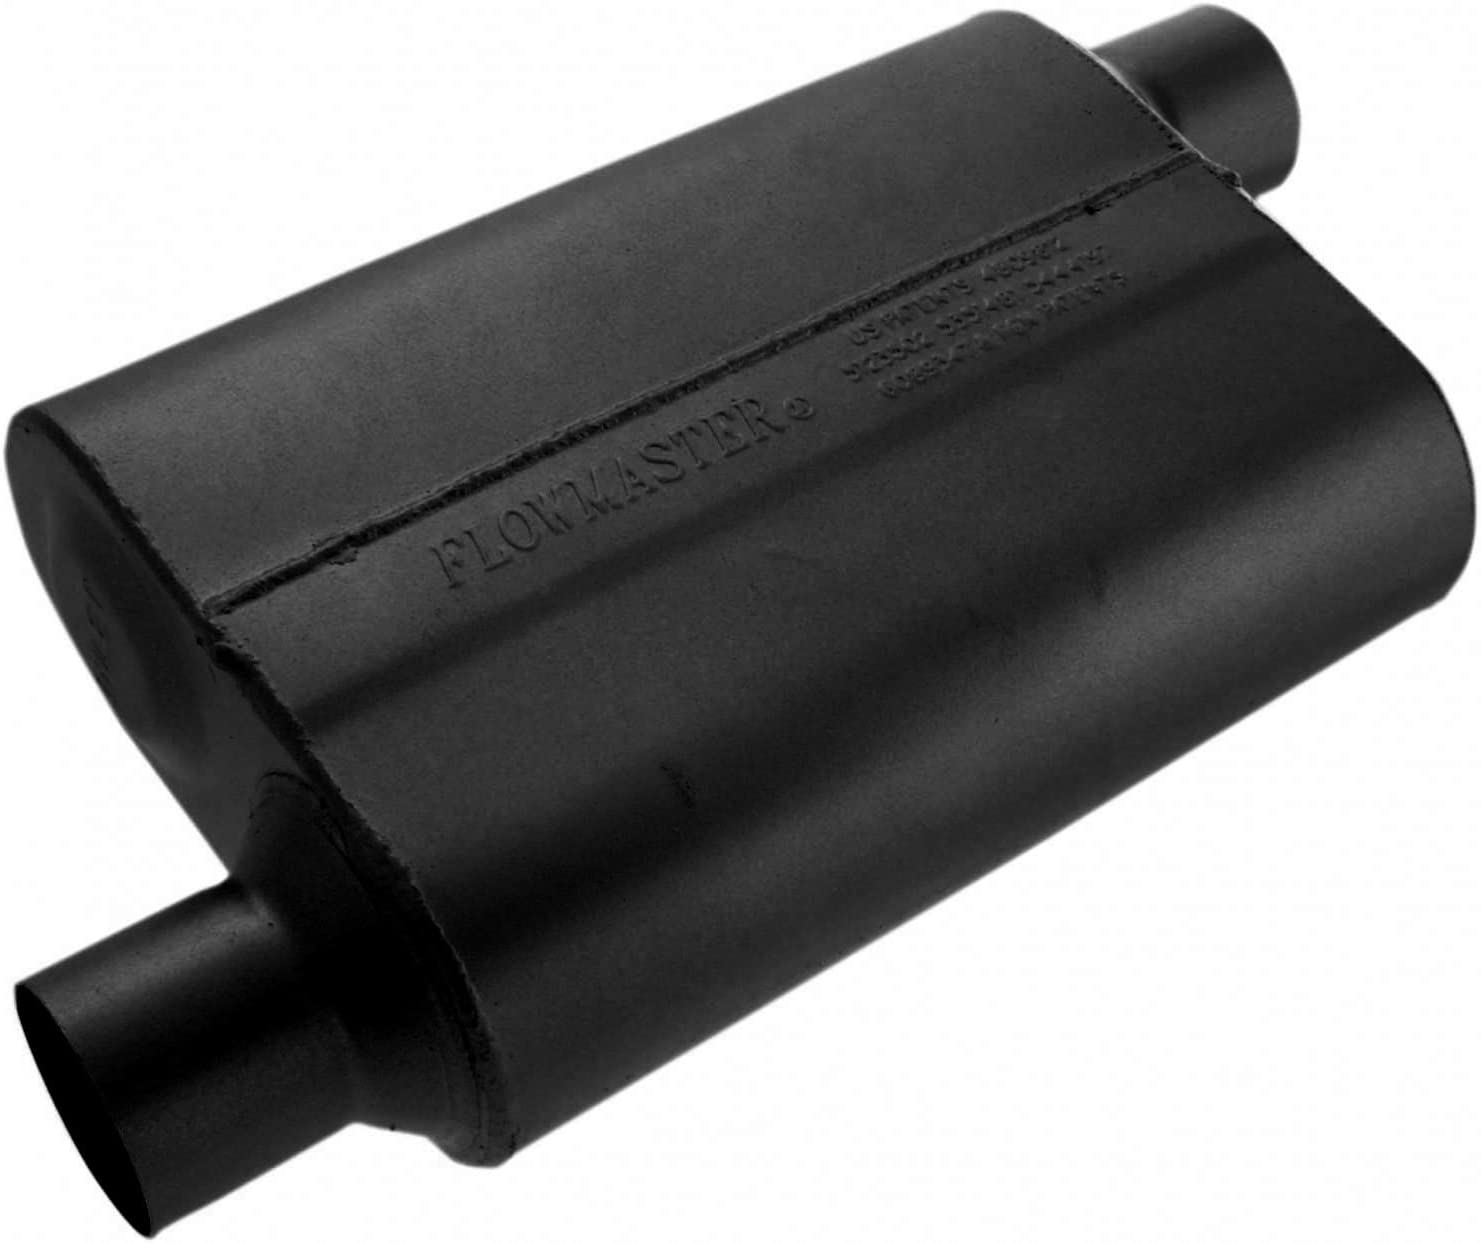 B000182DMY Flowmaster 42543 40 Series Muffler - 2.50 Offset IN / 2.50 Offset OUT - Aggressive Sound 61Dki9DnBfL.SL1500_